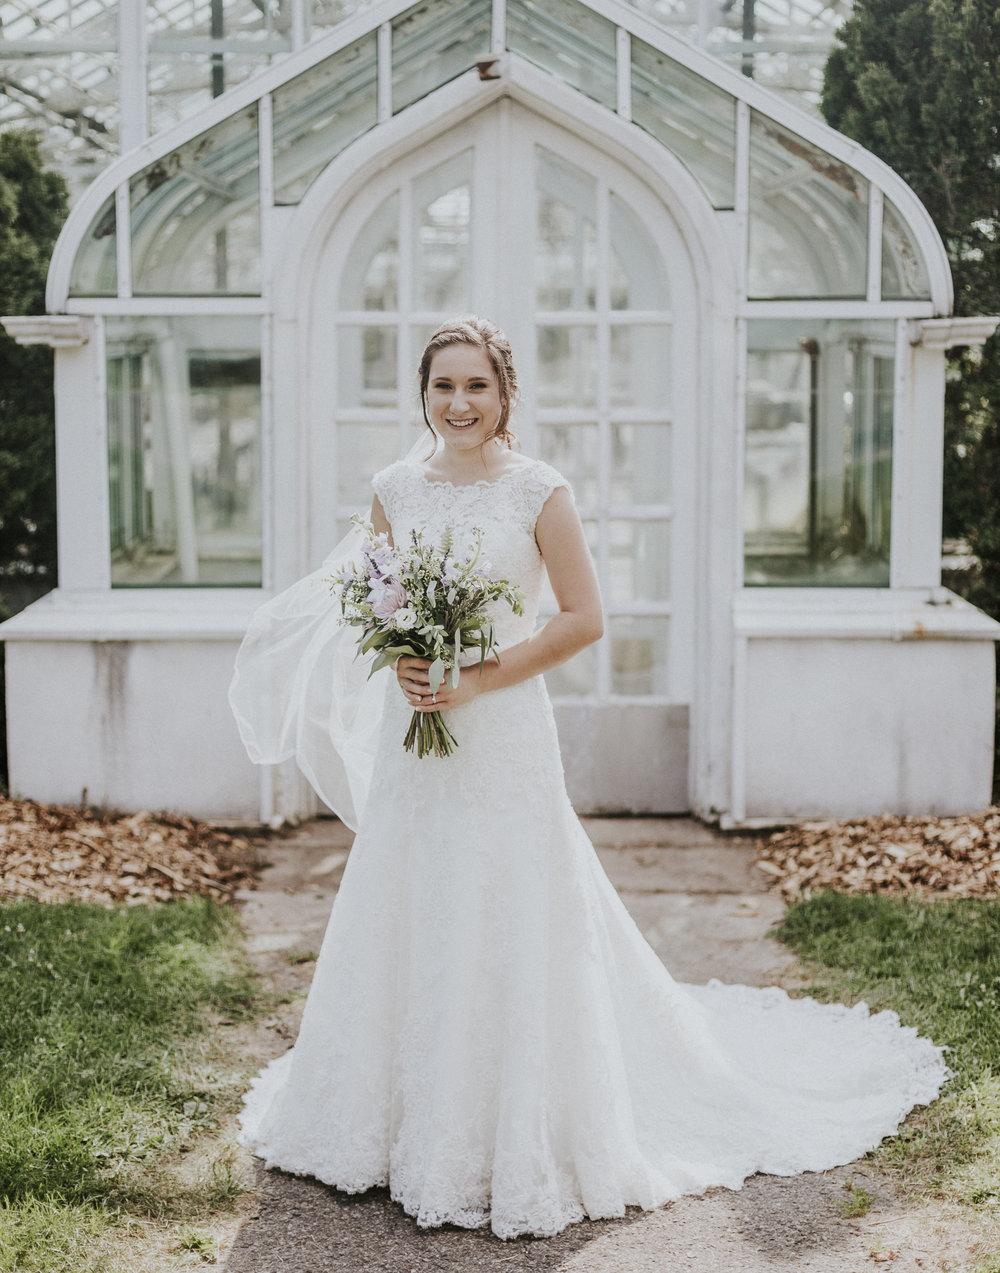 FORMALS+WEDDING-PARTY-059.jpg